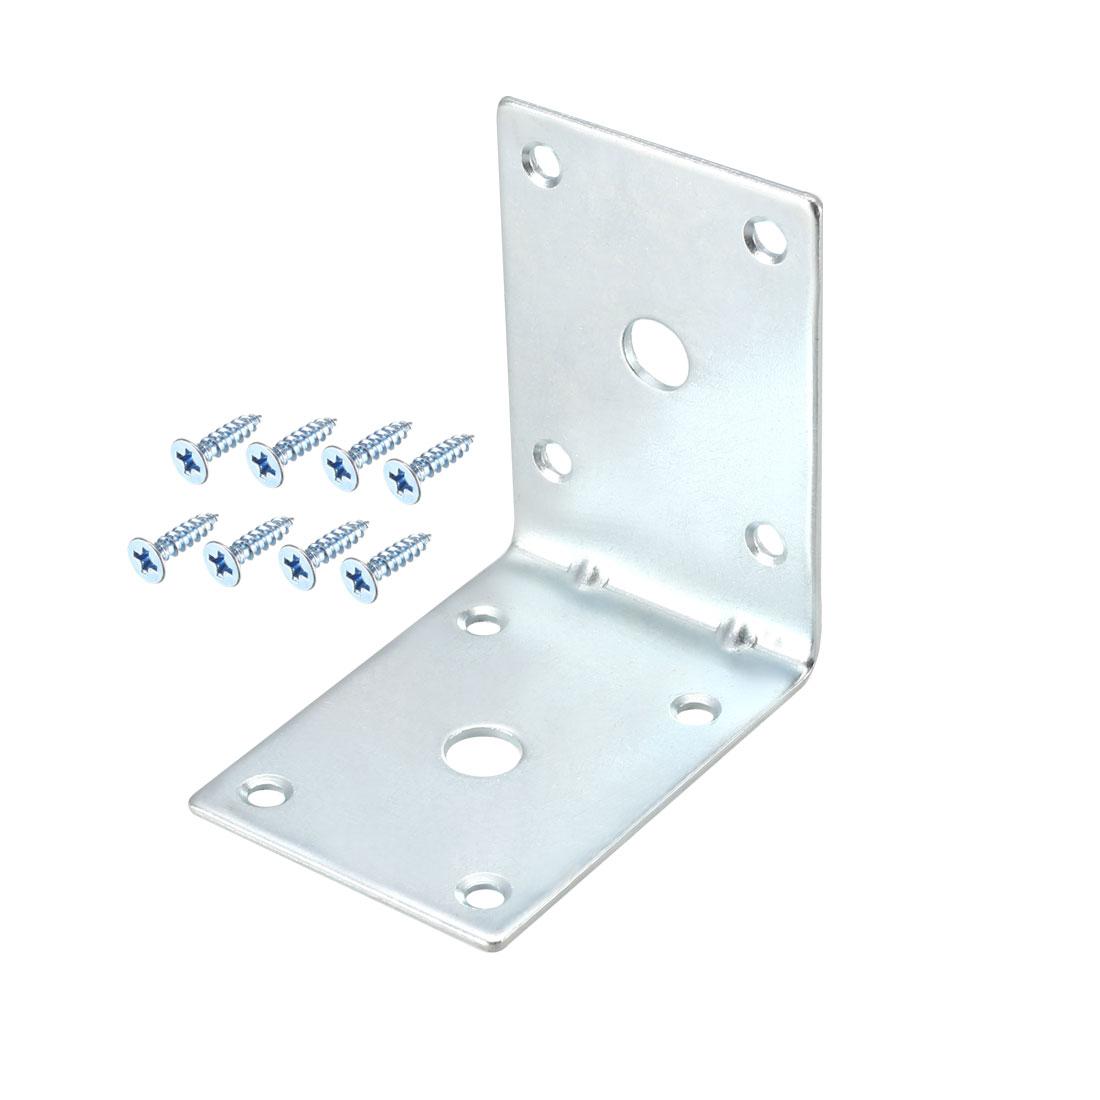 Corner Brace, 71mm x 71mm Zinc Plated Joint Right Angle Bracket w Screws, 6 Pcs